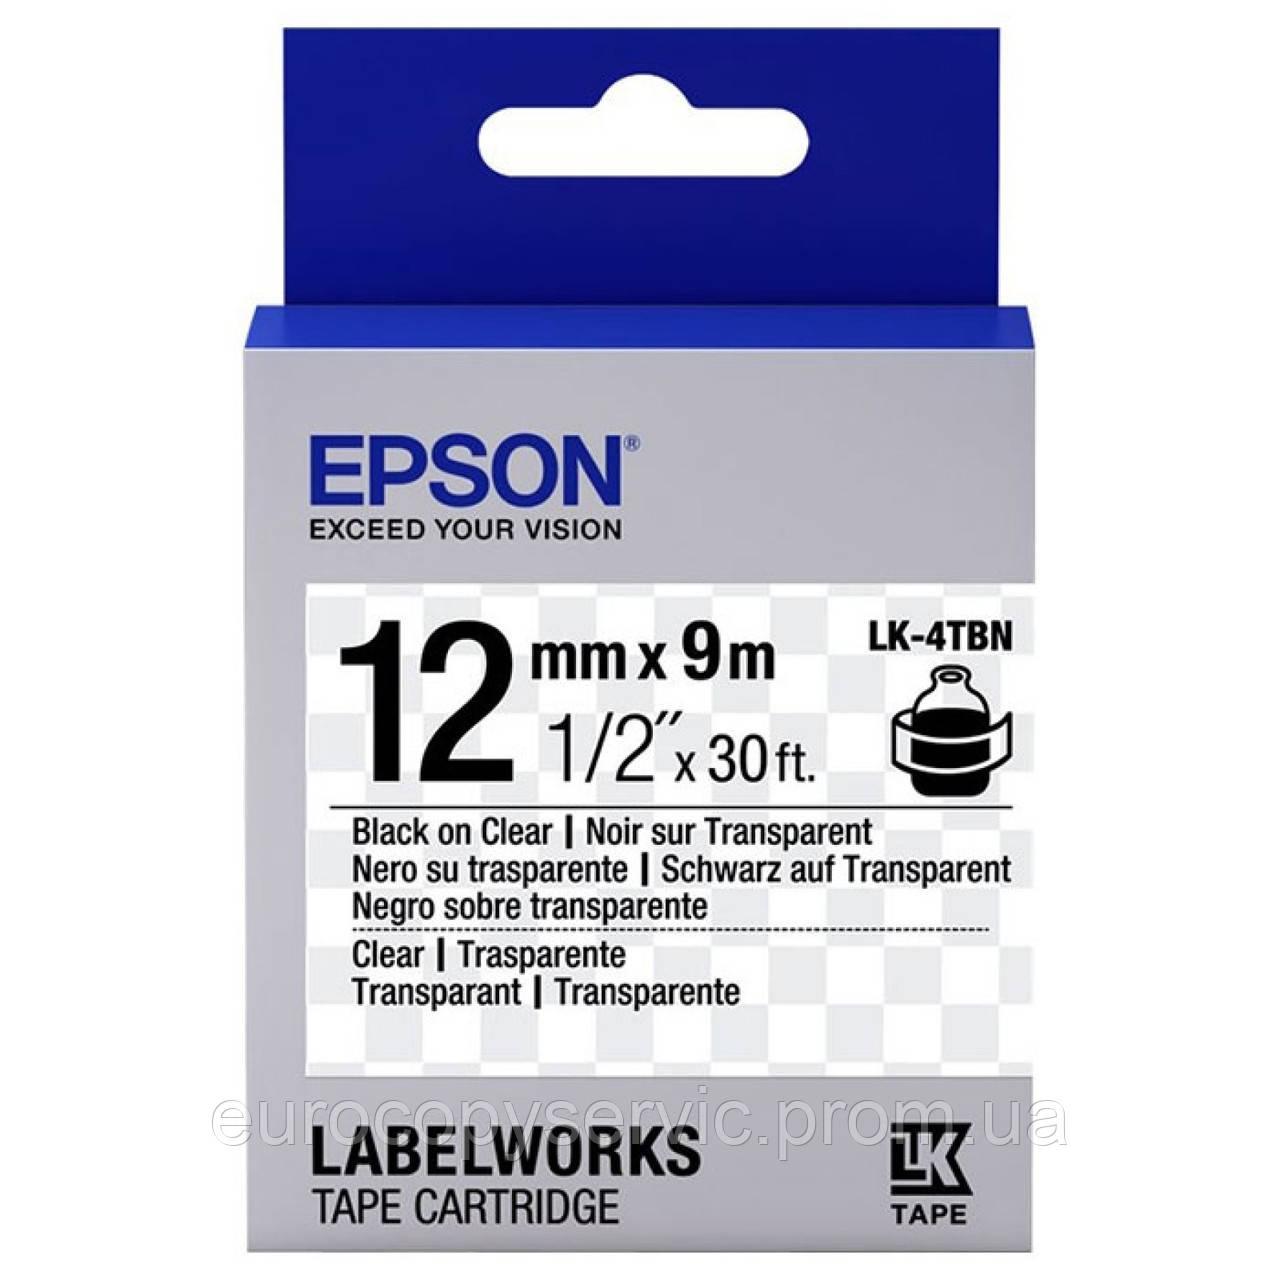 Картридж Epson Black/Clear 12mm x 9m (C53S654012) Original